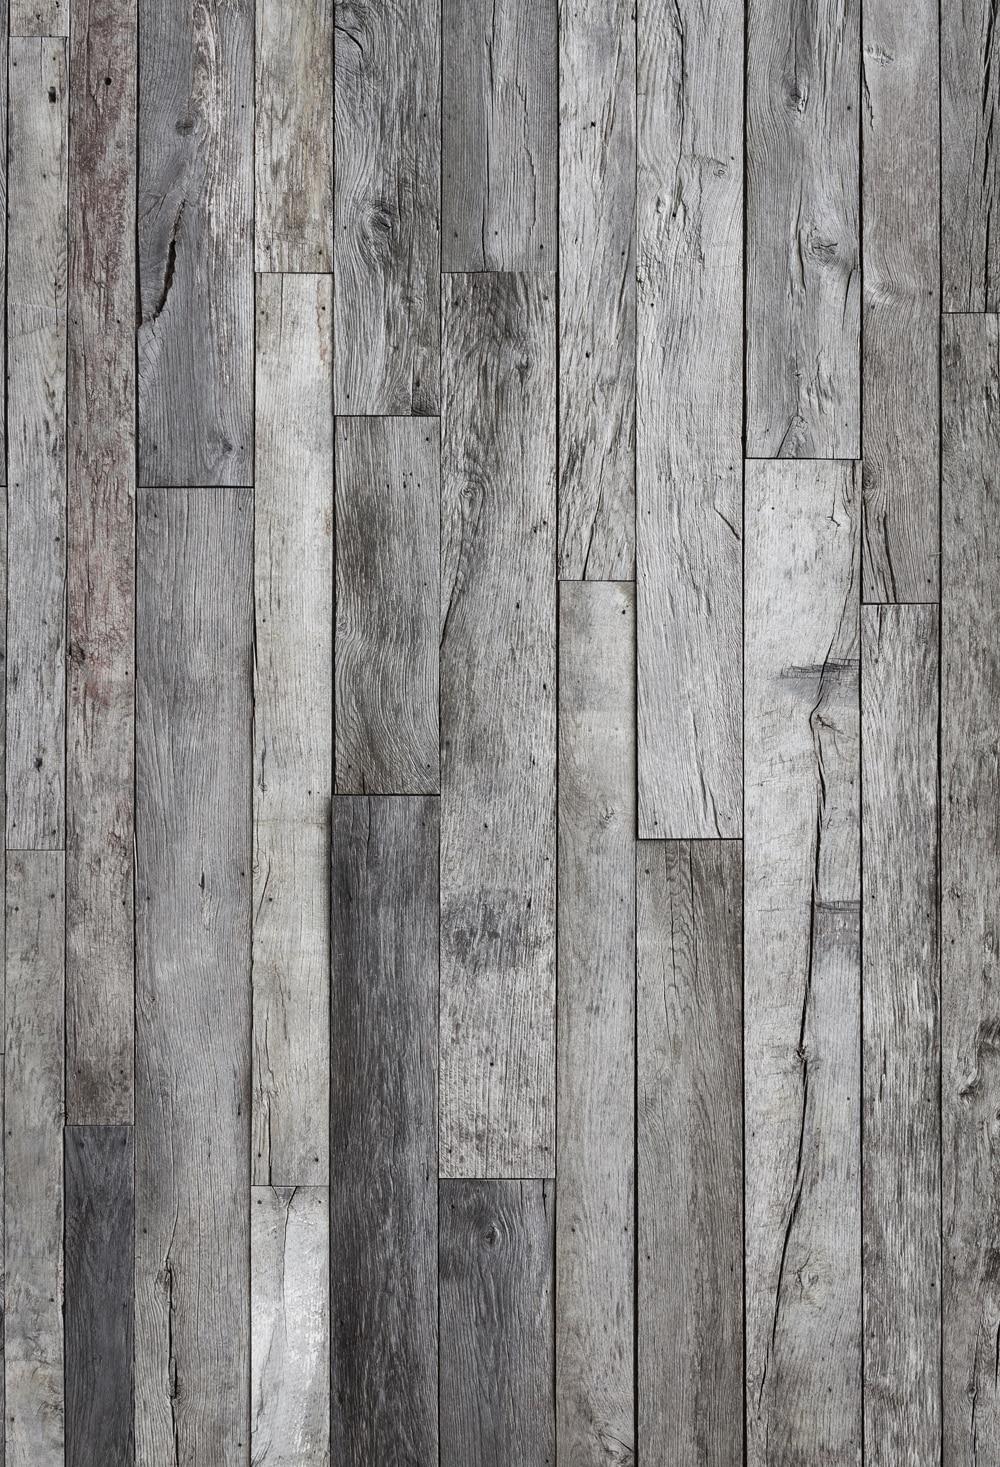 Dark Grey Wood Background Wooden Floor Photography Backdrops Newborn Photo Props Baby Shower